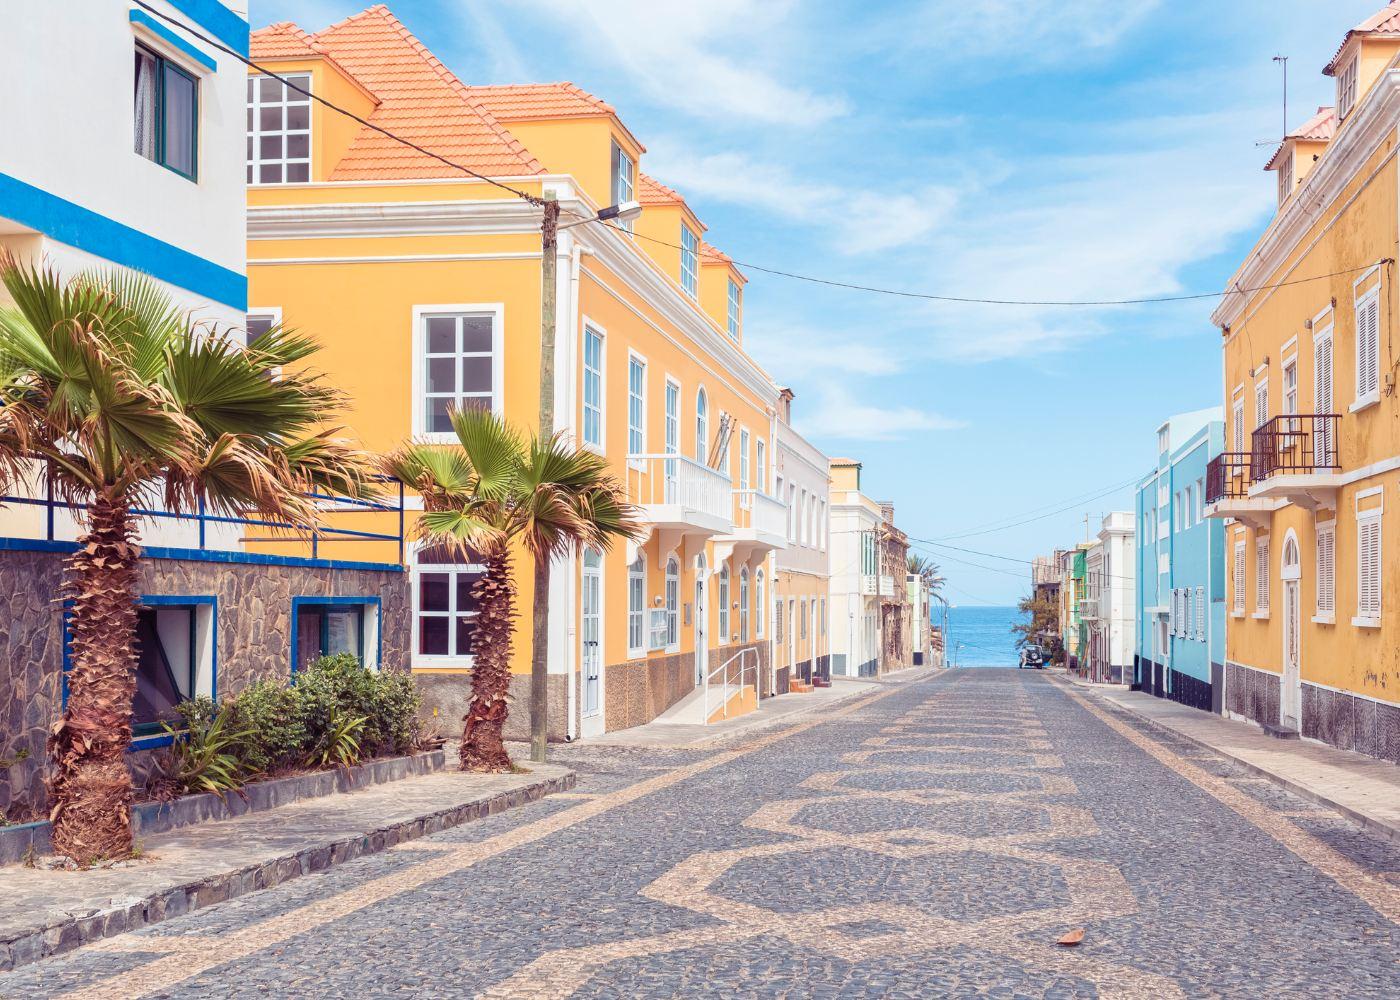 Ruas de Cabo Verde